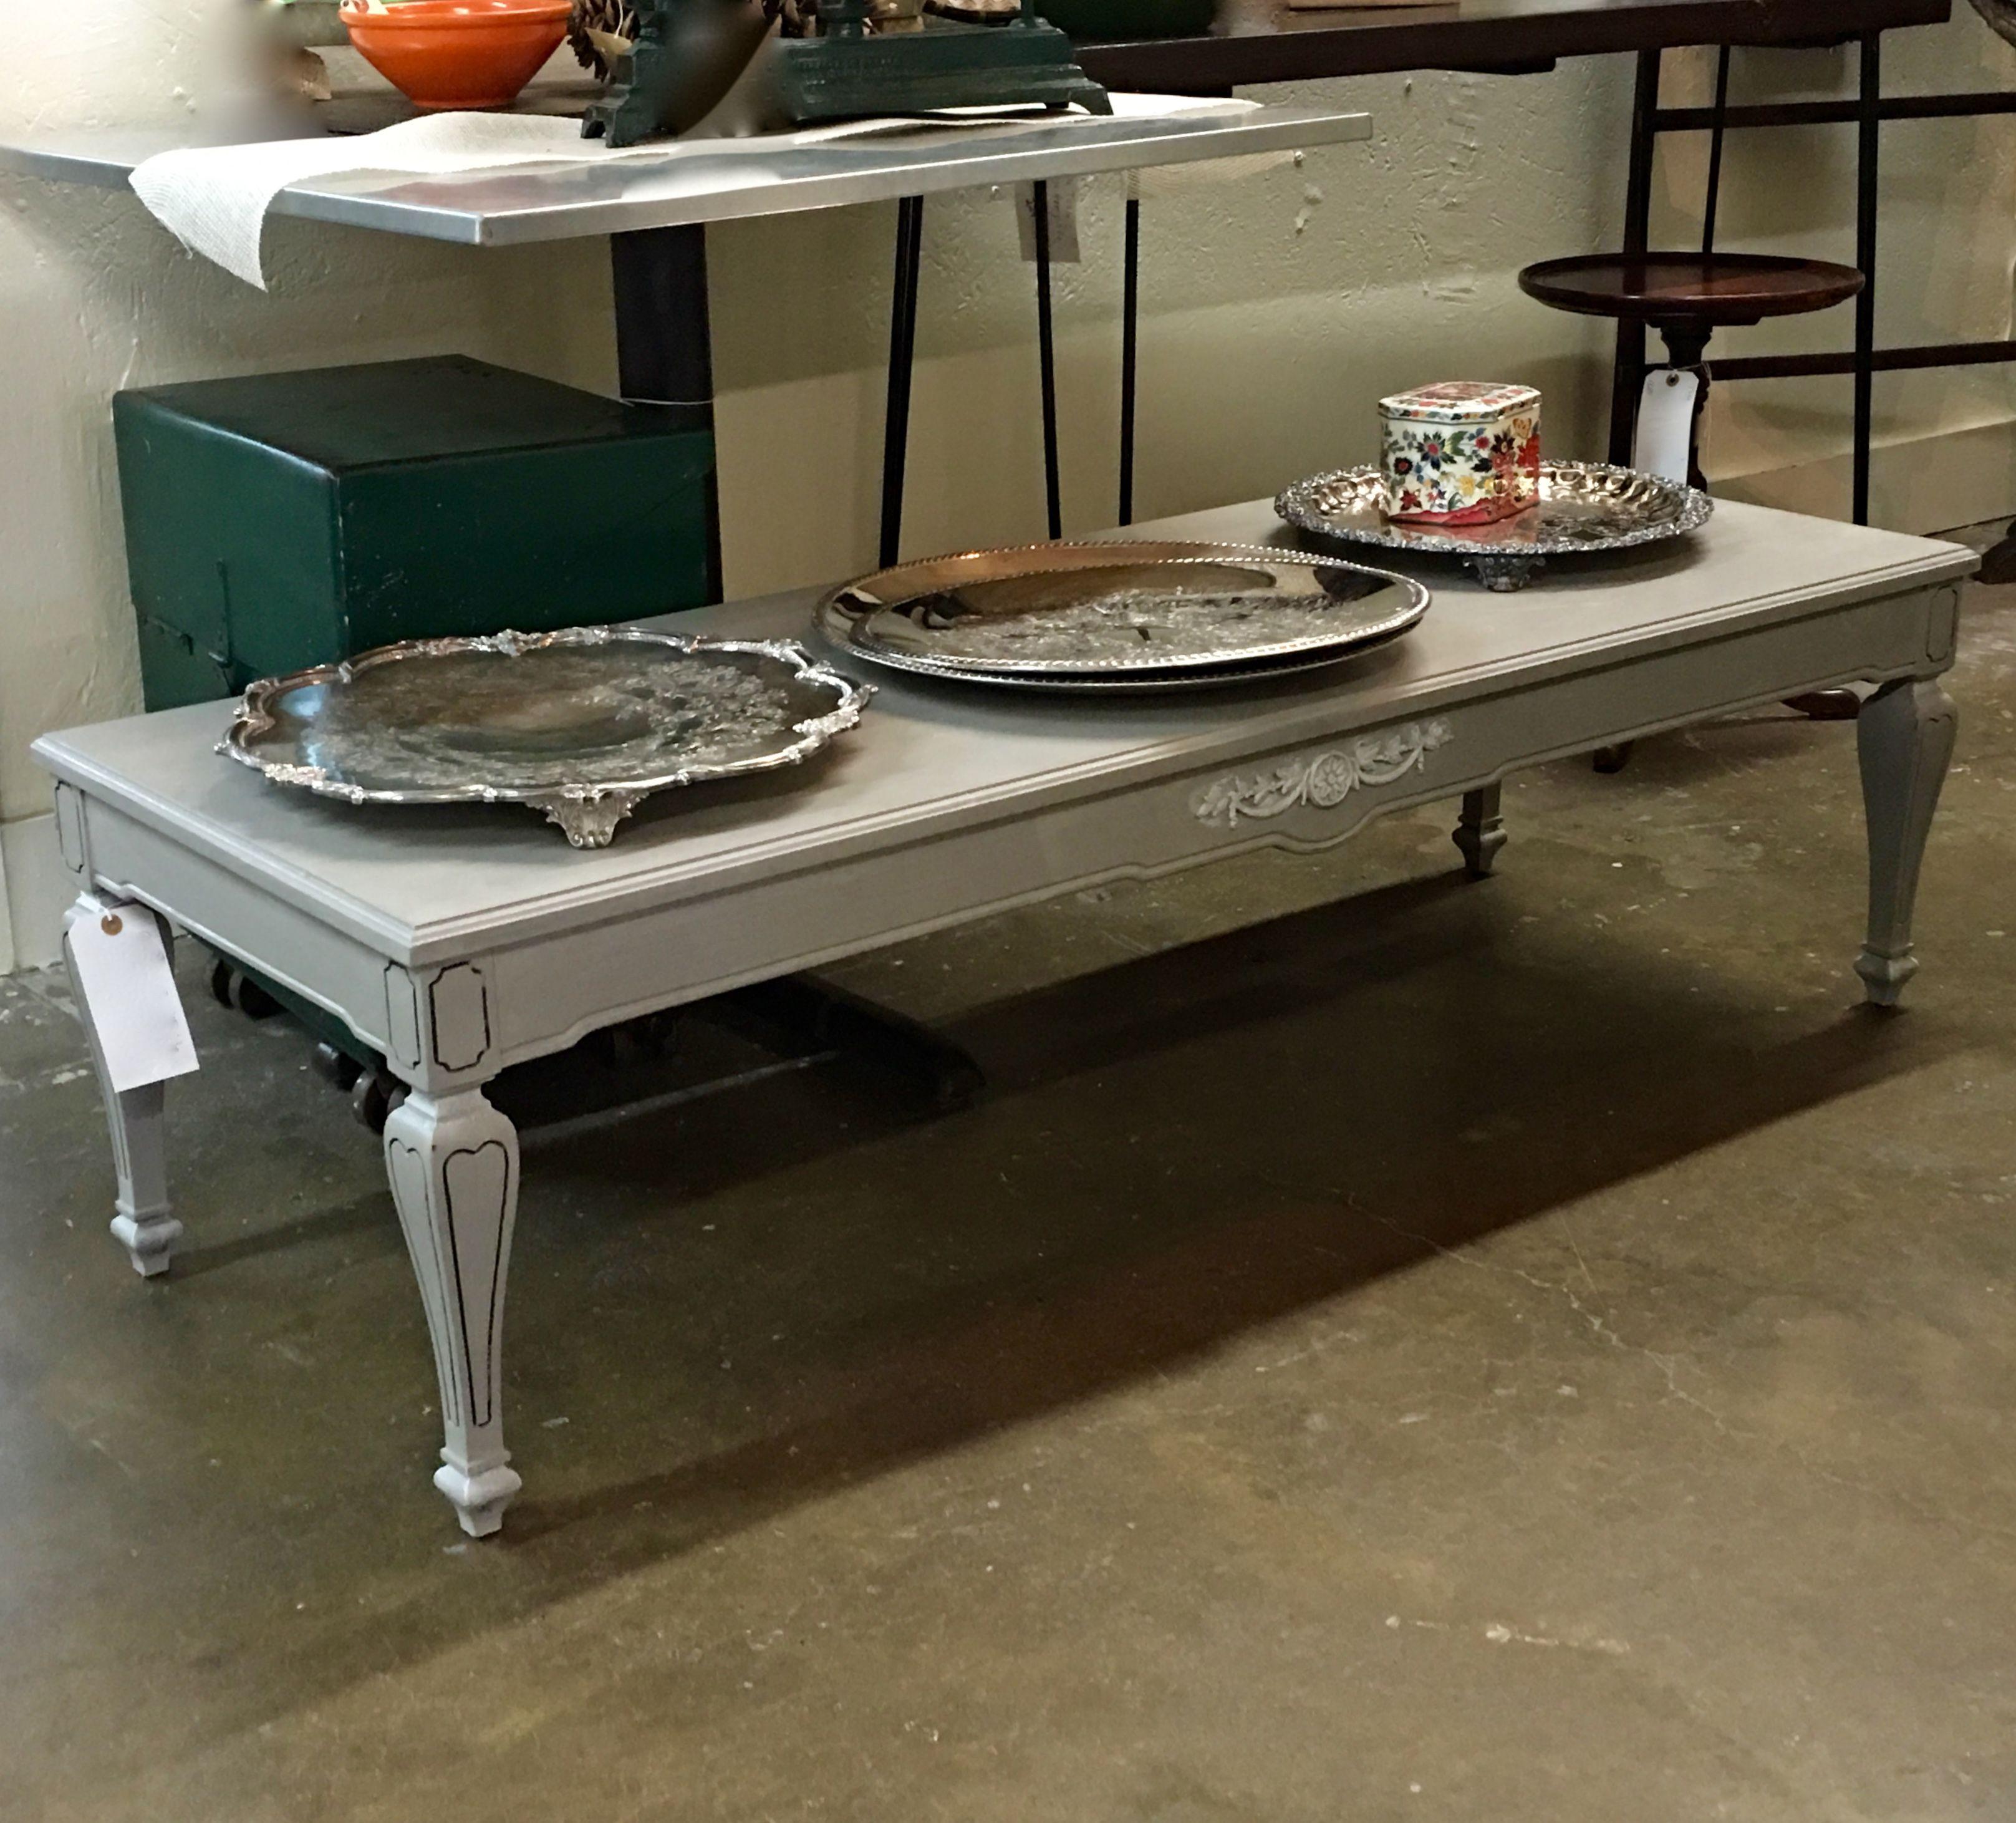 Elephants Digestive System Grey Coffee Table On 56 Wide X 21 Deep 15 High